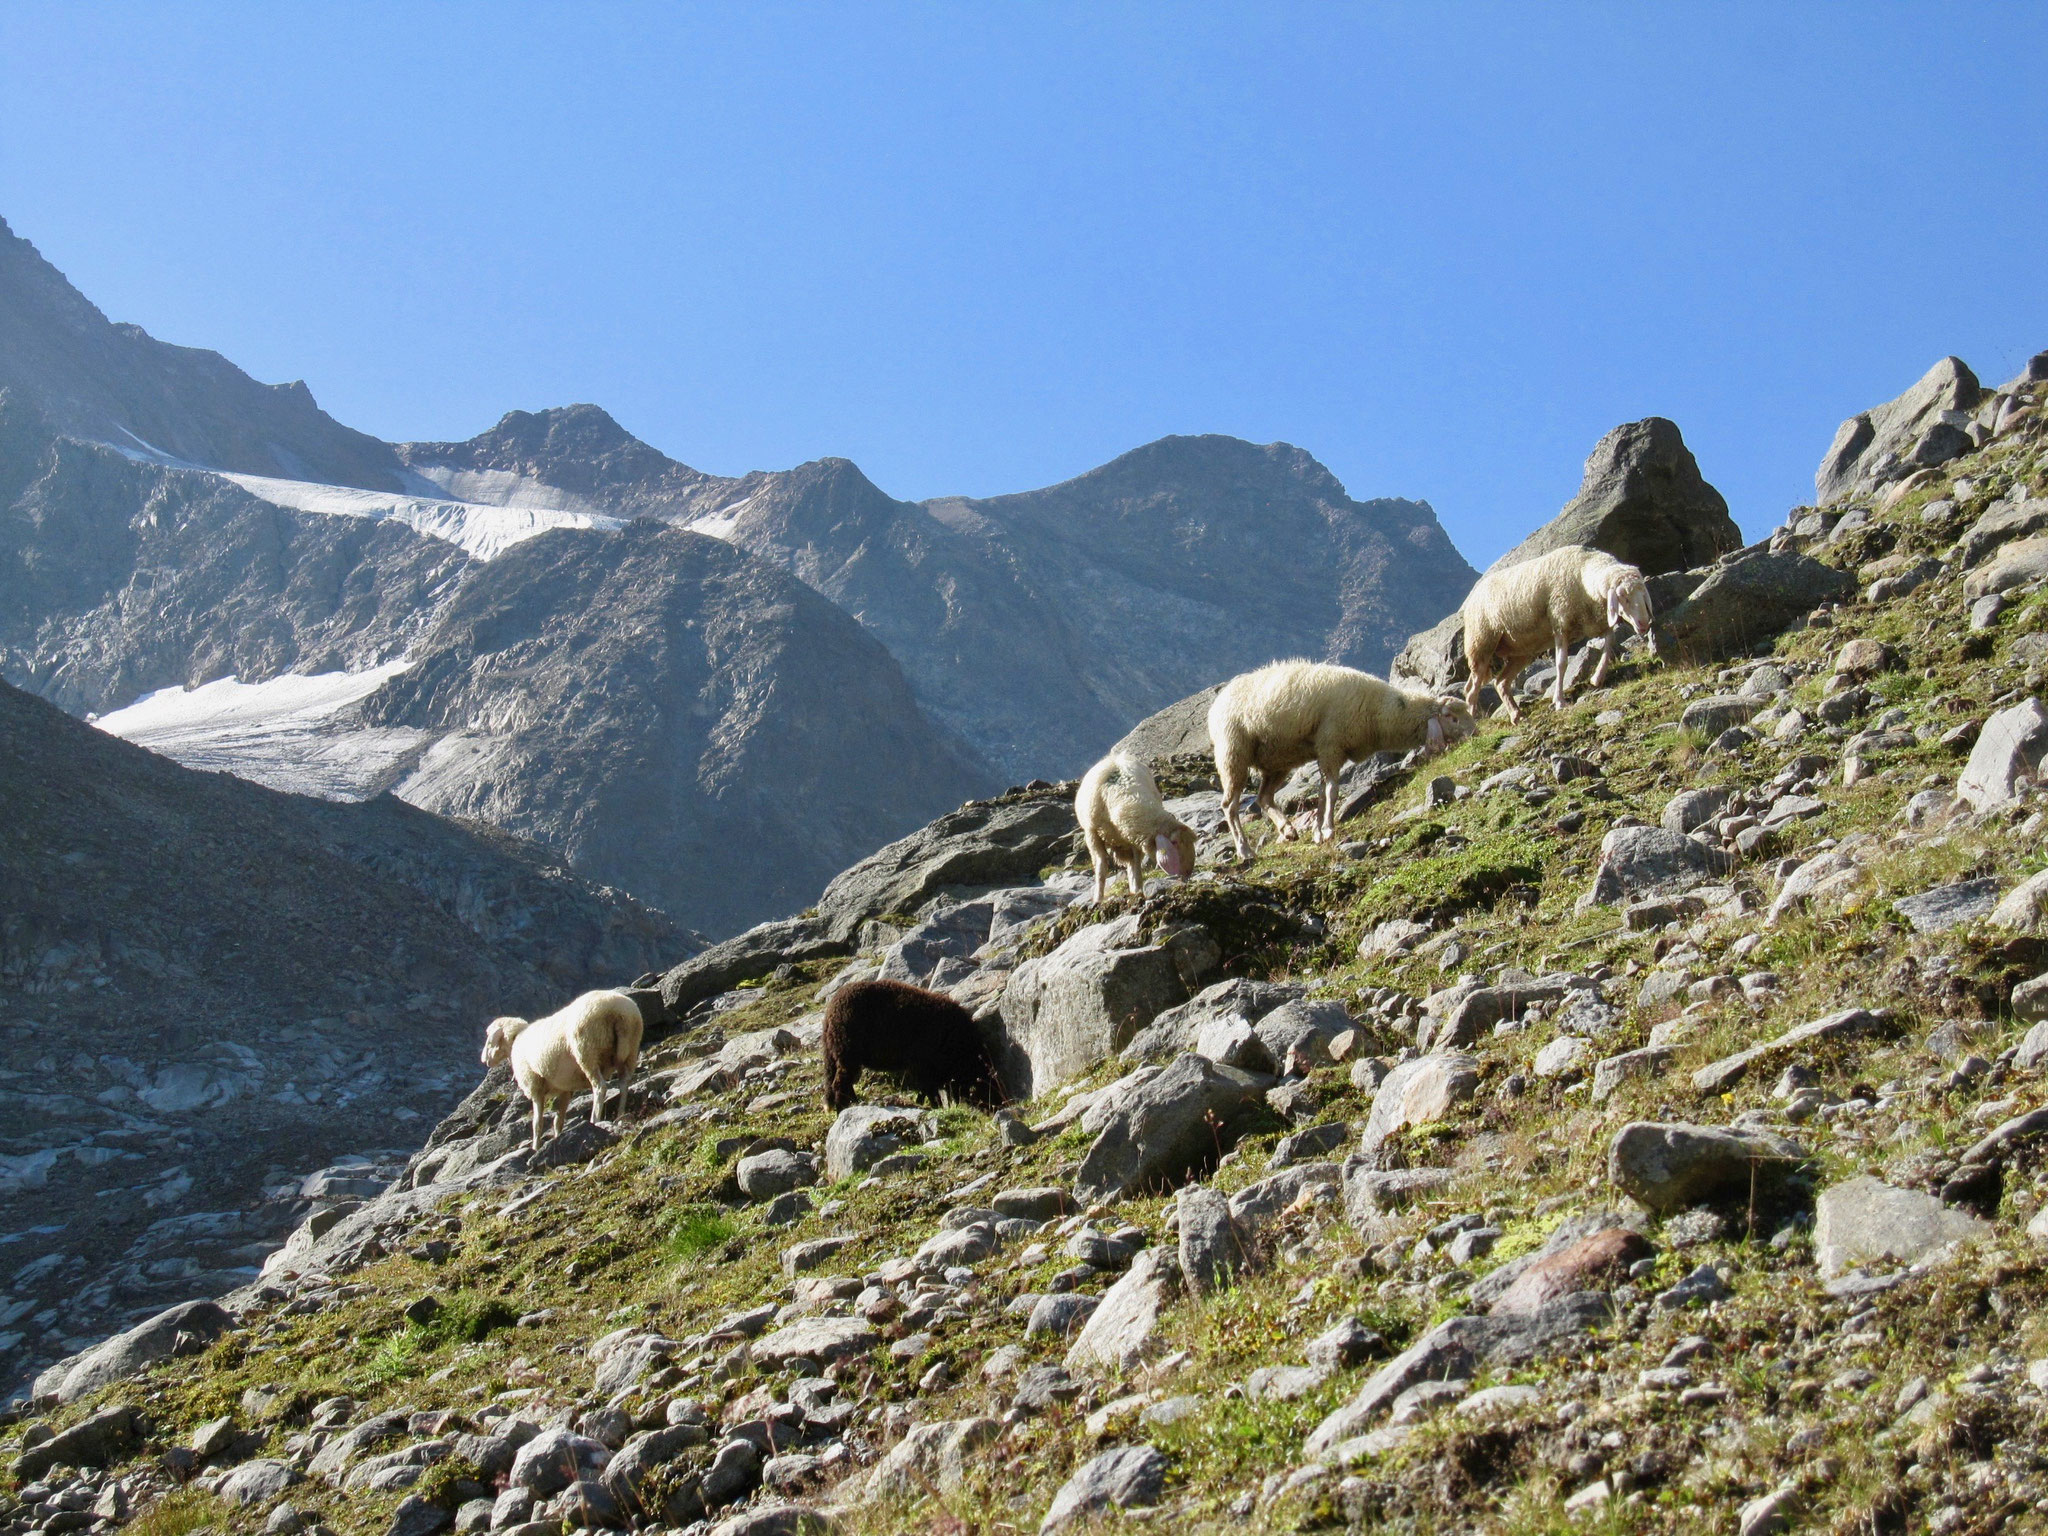 Schafe waren in den höheren Lagen unterwegs